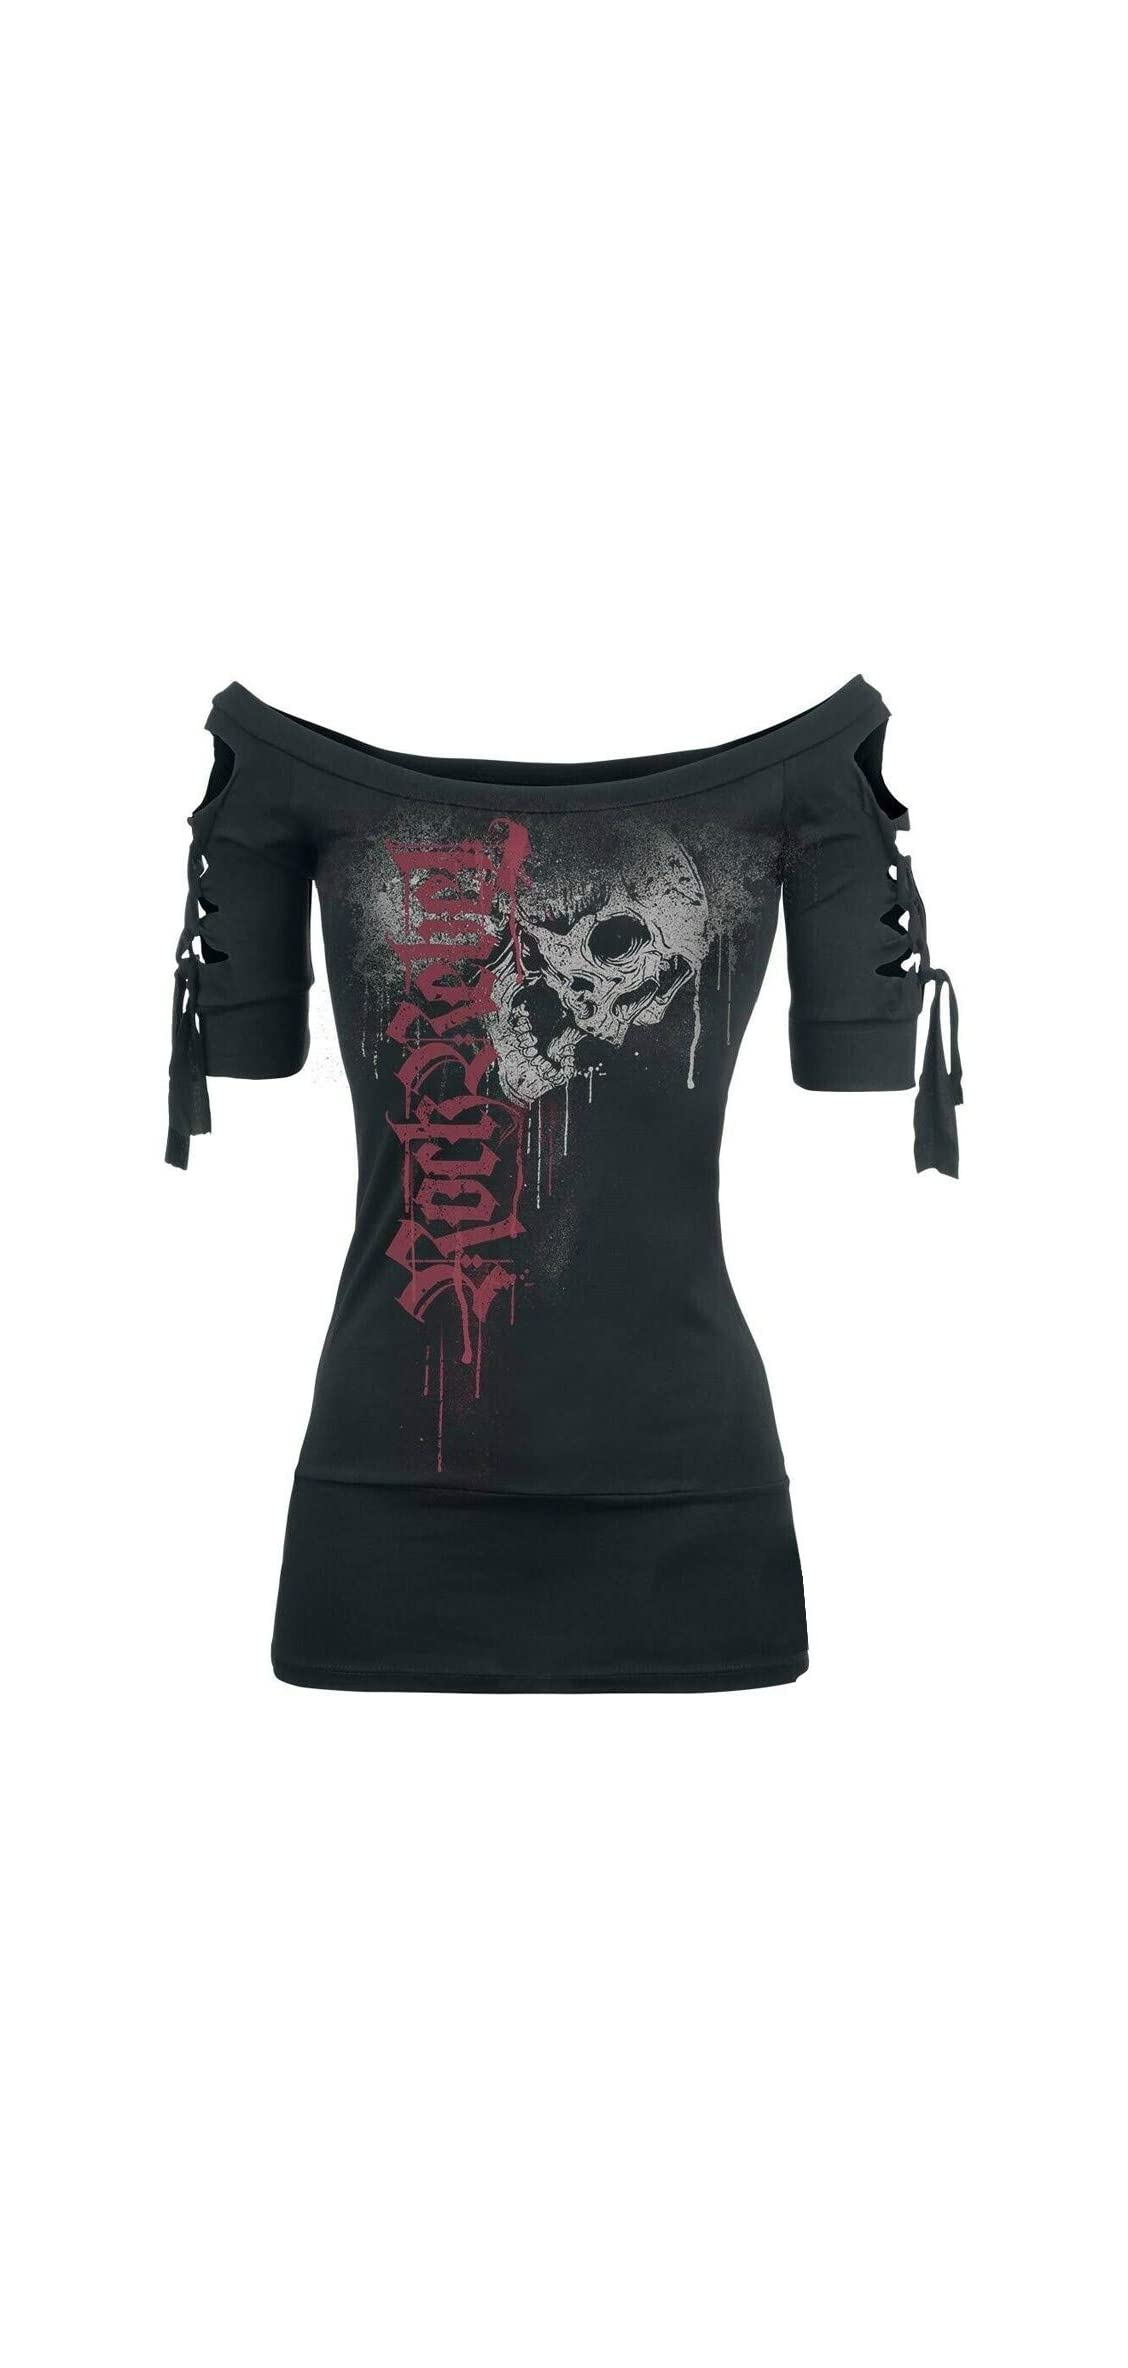 Big Sale  Women's Fashion Skull Printed Cool Black